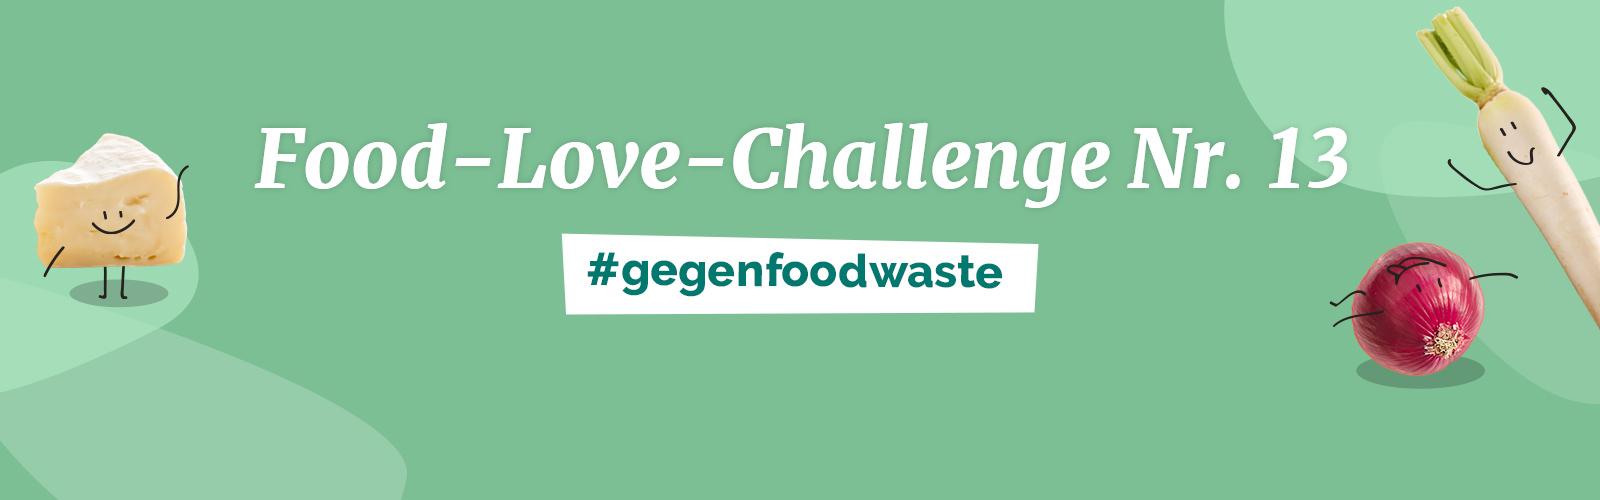 Food Love Challenge Nr. 13